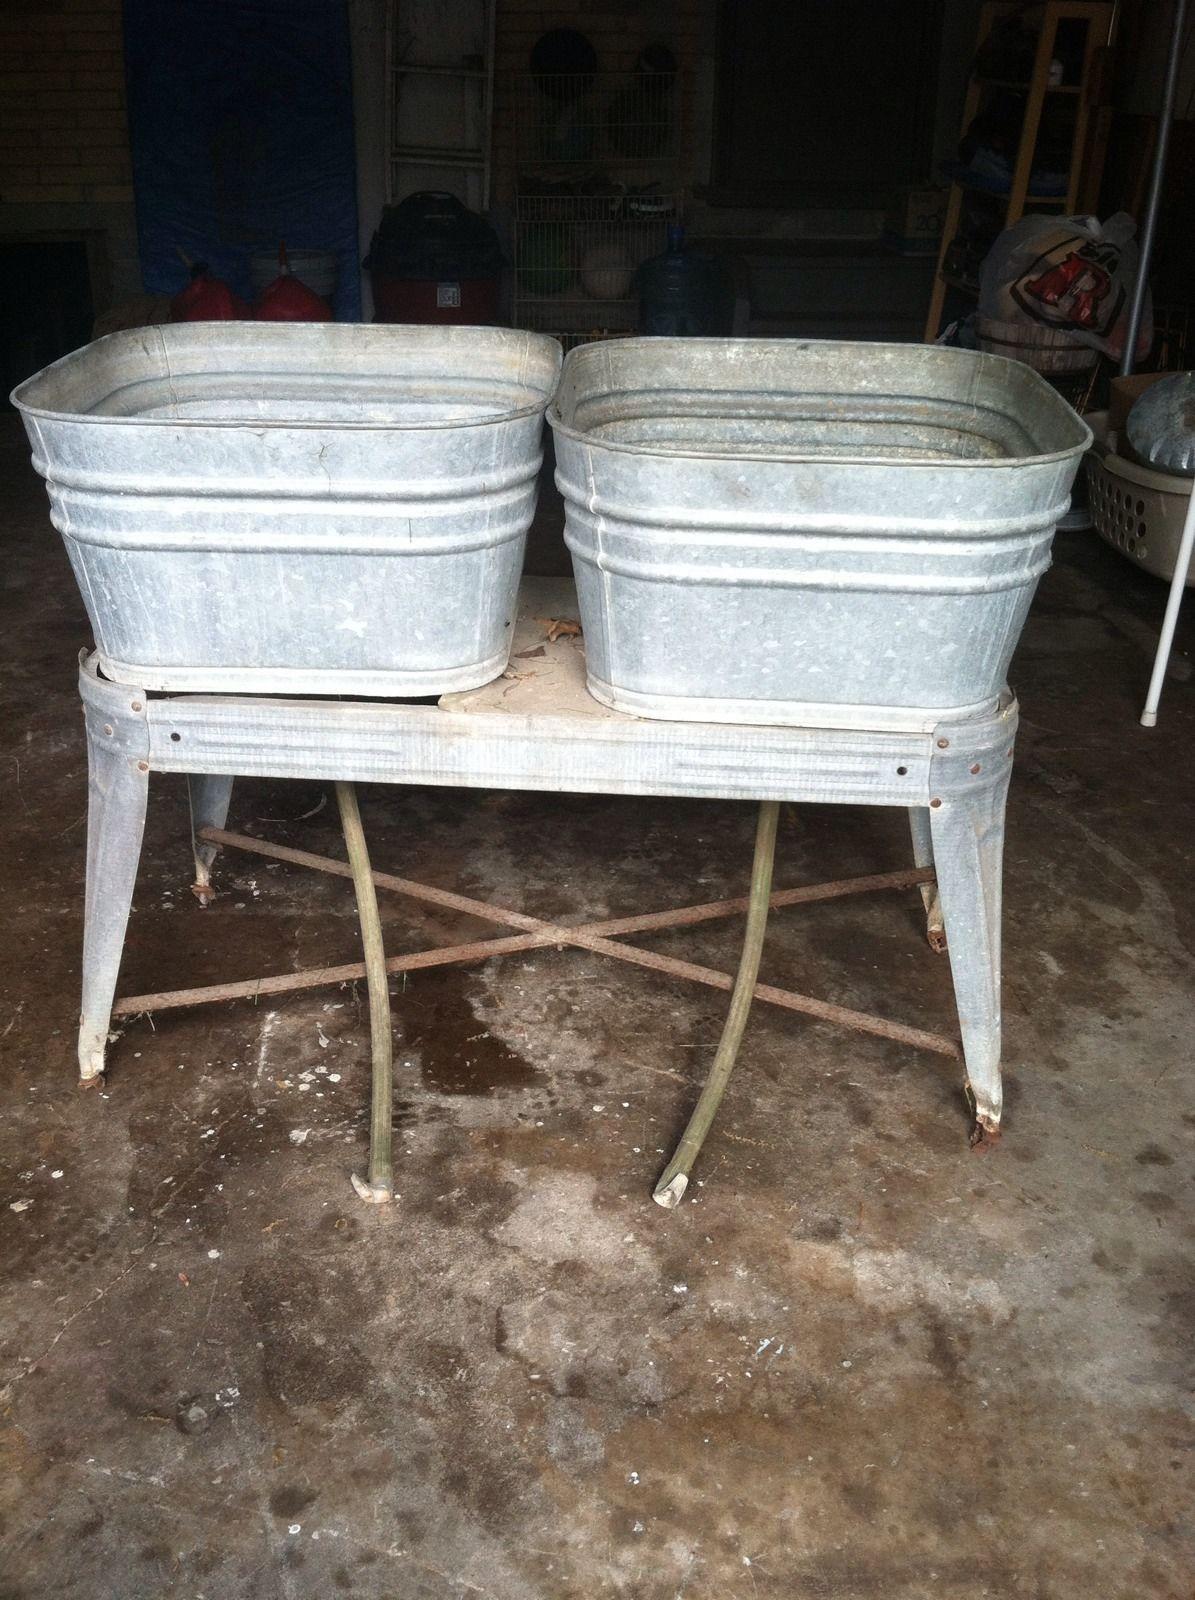 Laundry sink ebay - Vtg Galvanized Metal Double Wash Tubs Wheeled Stand Rinse Sink Plant Wedding Ice Ebay